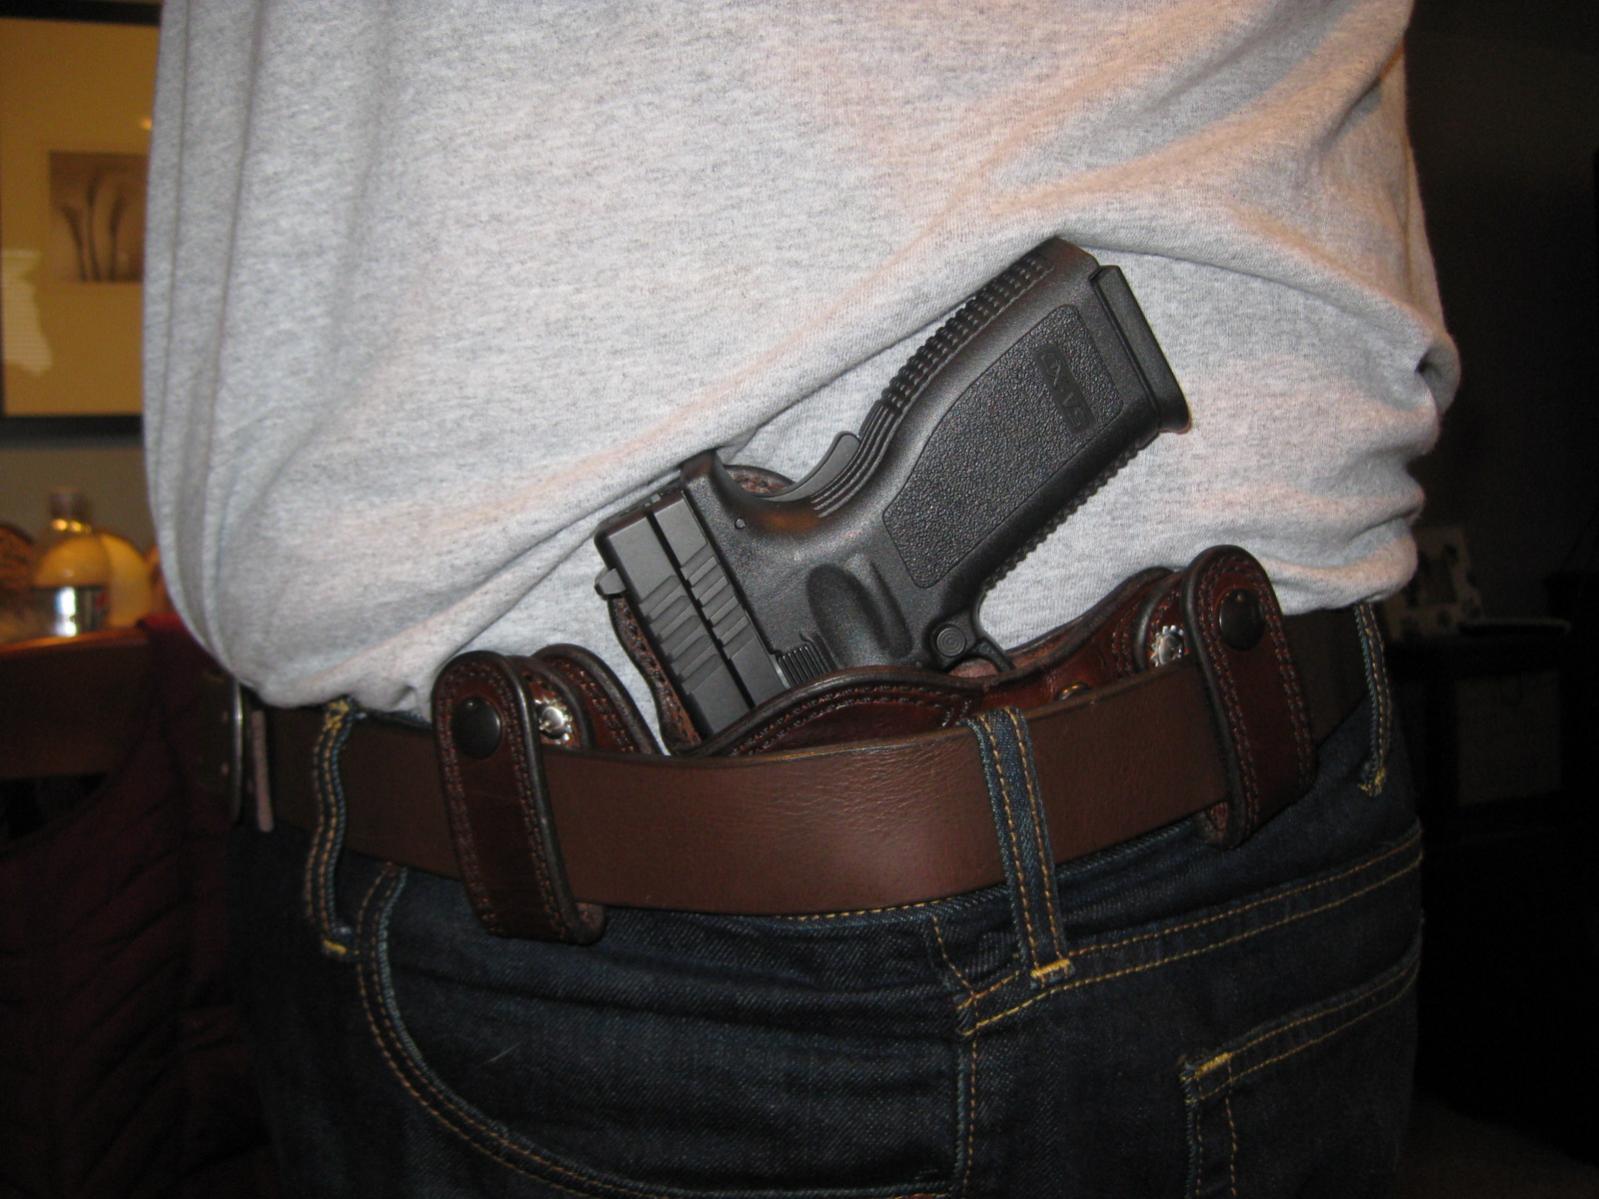 Brigade Gun Leather feedback...-img_0576.jpg